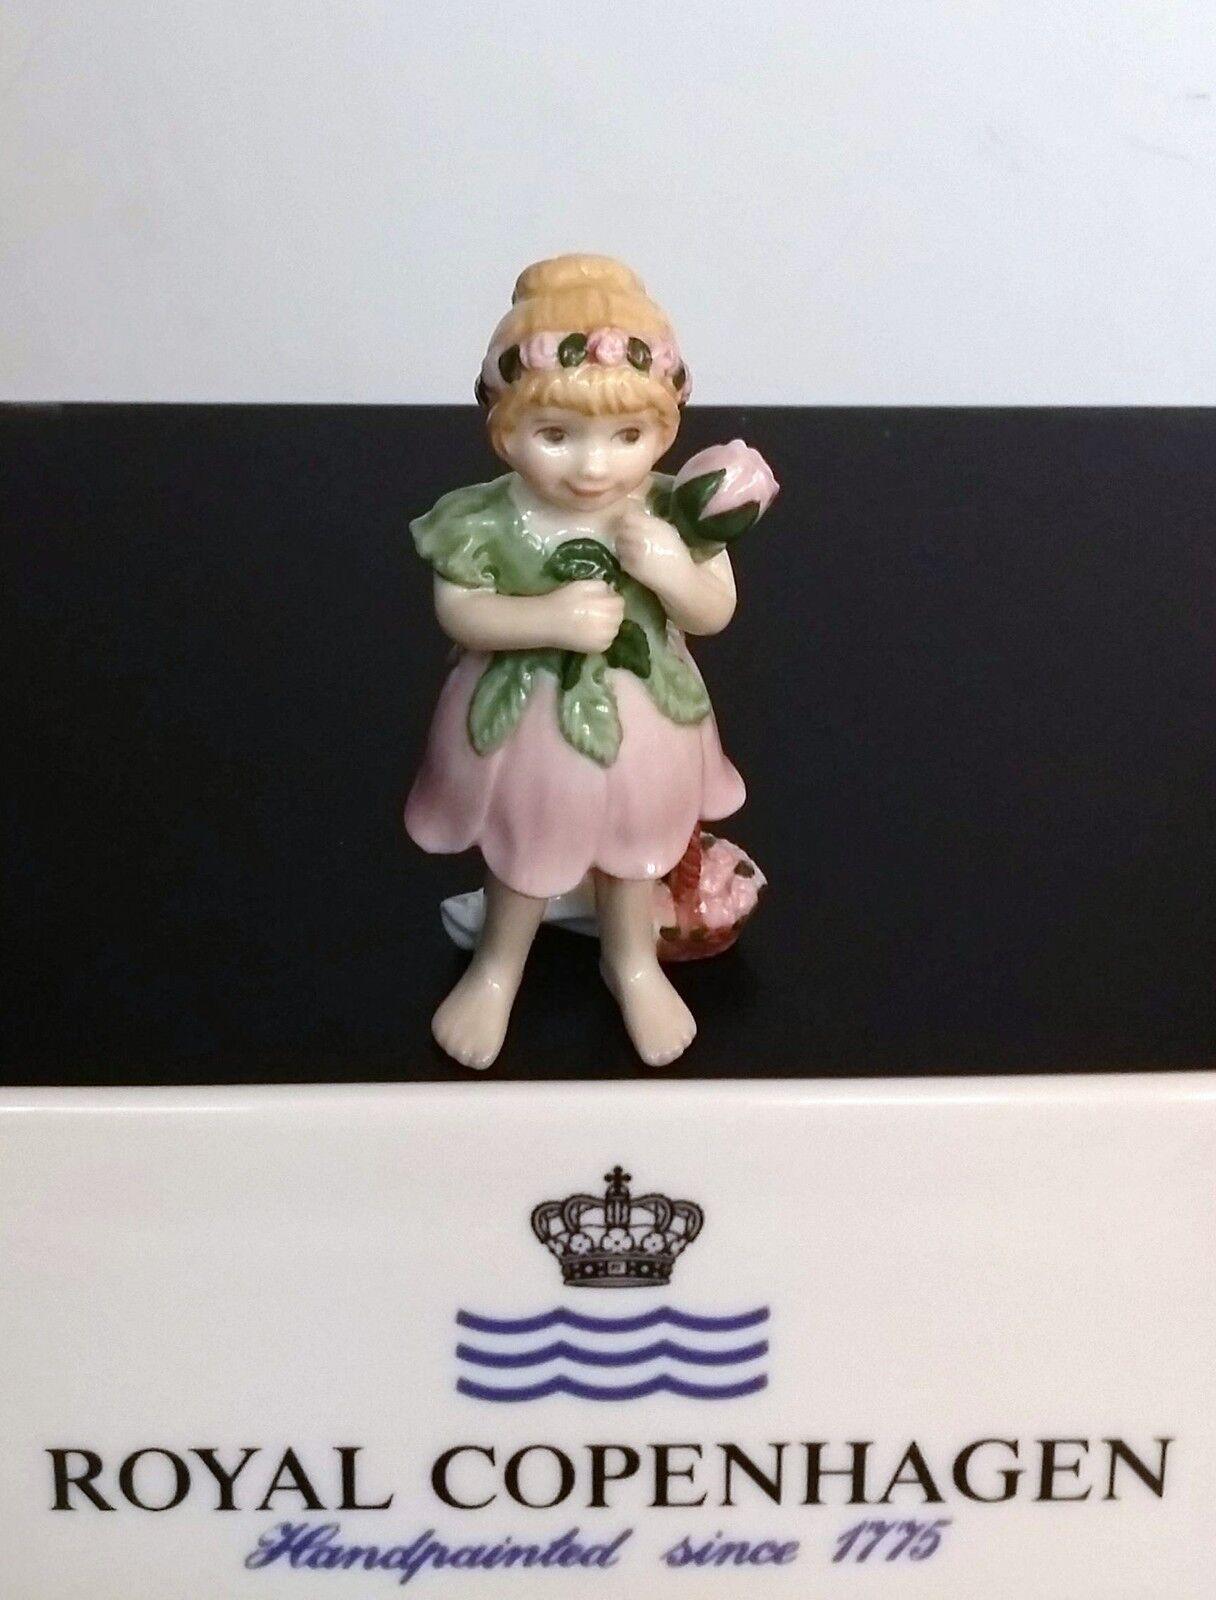 Royal Copenhagen Cigarettes - Gemma Mini - Royal Copenhagen Petite Statue